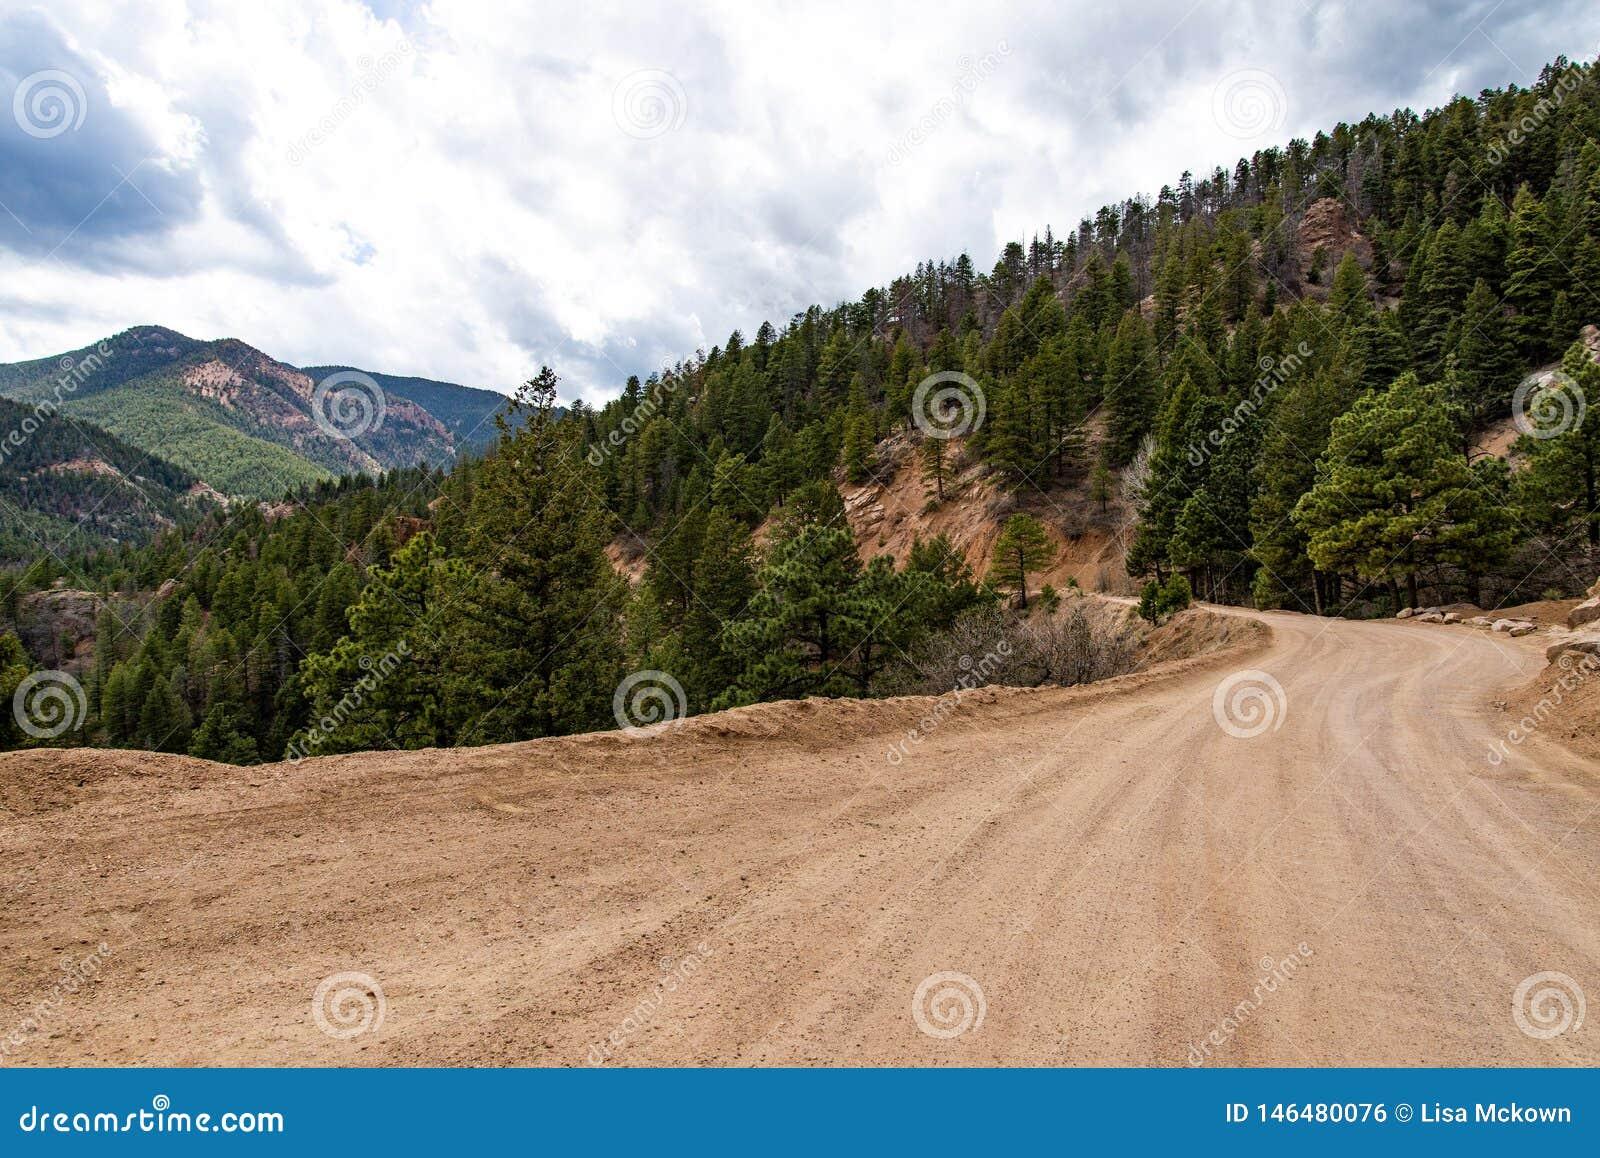 North cheyenne canyon canon colorado springs